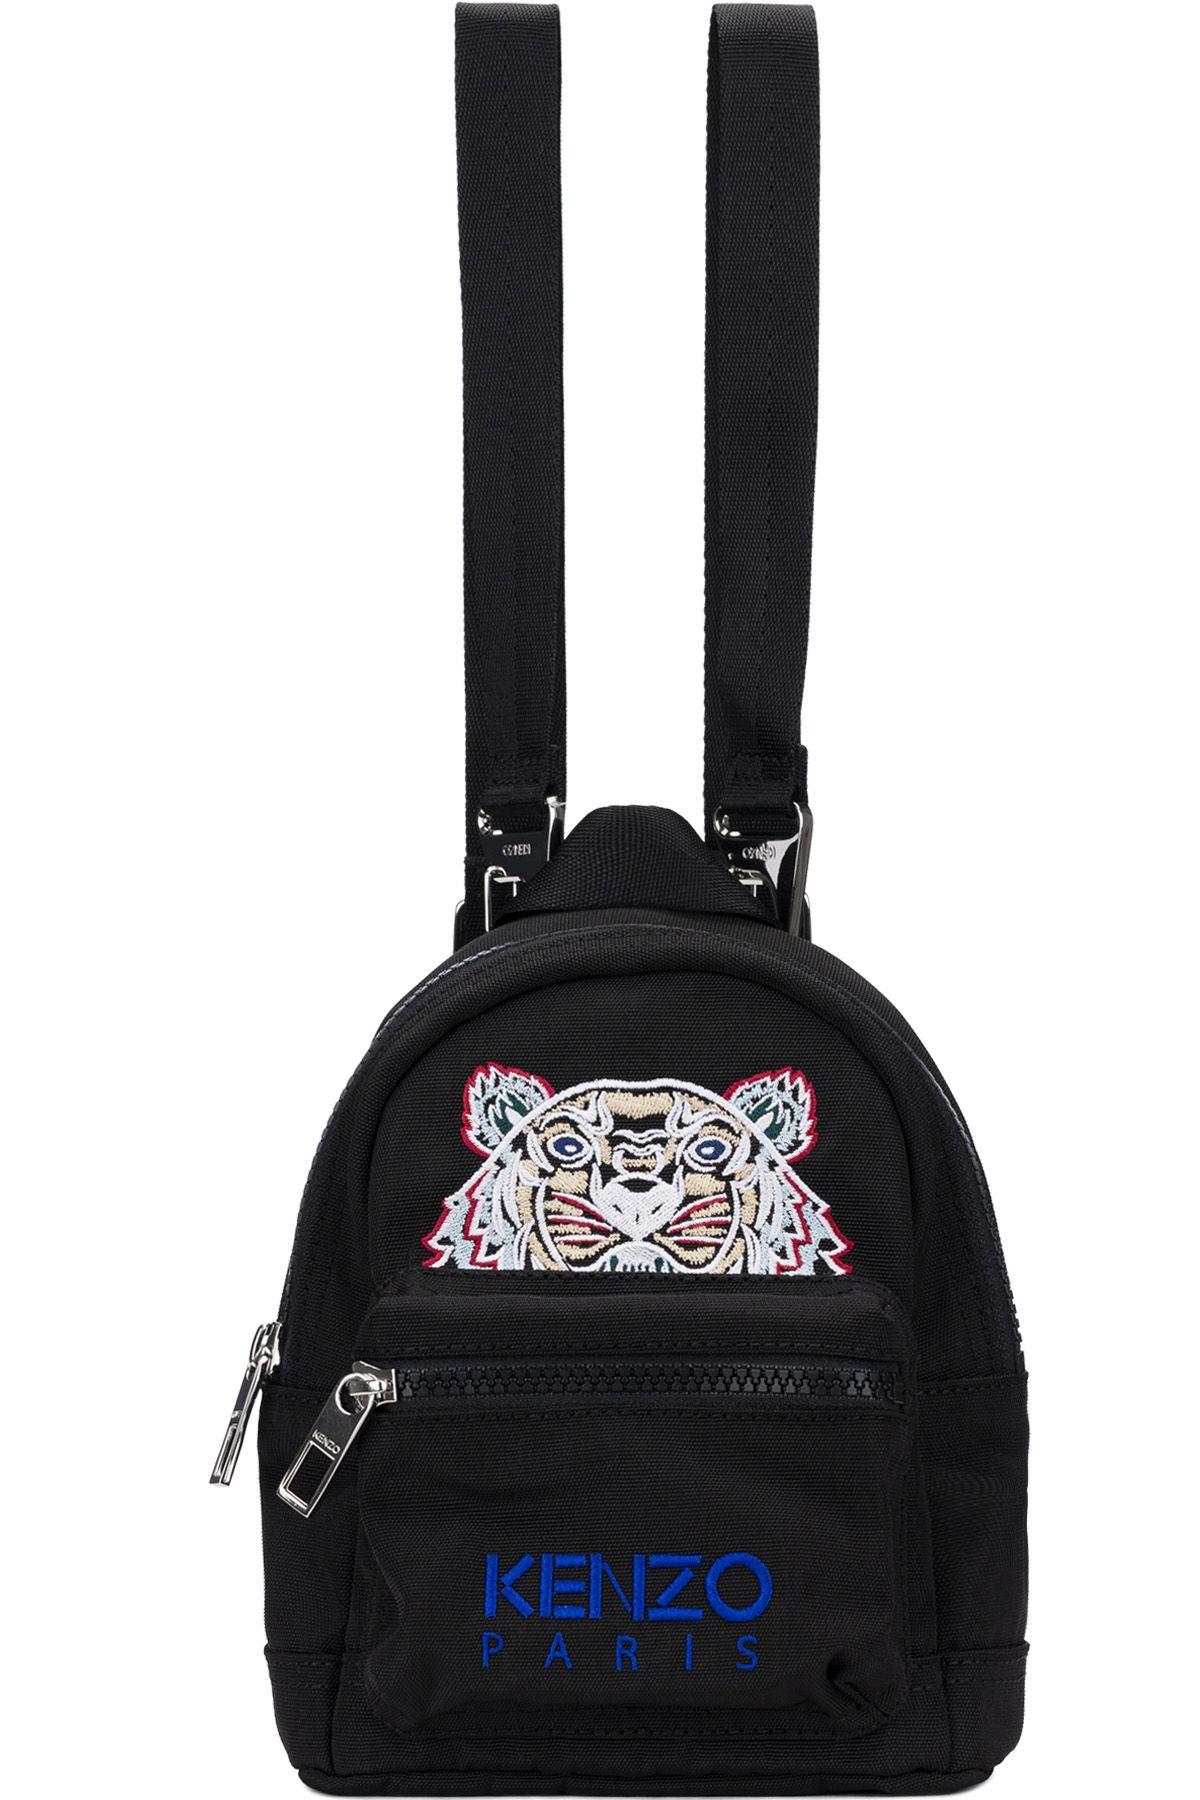 33b9a80dc3 Kenzo - Mini Tiger Canvas Backpacks - Black